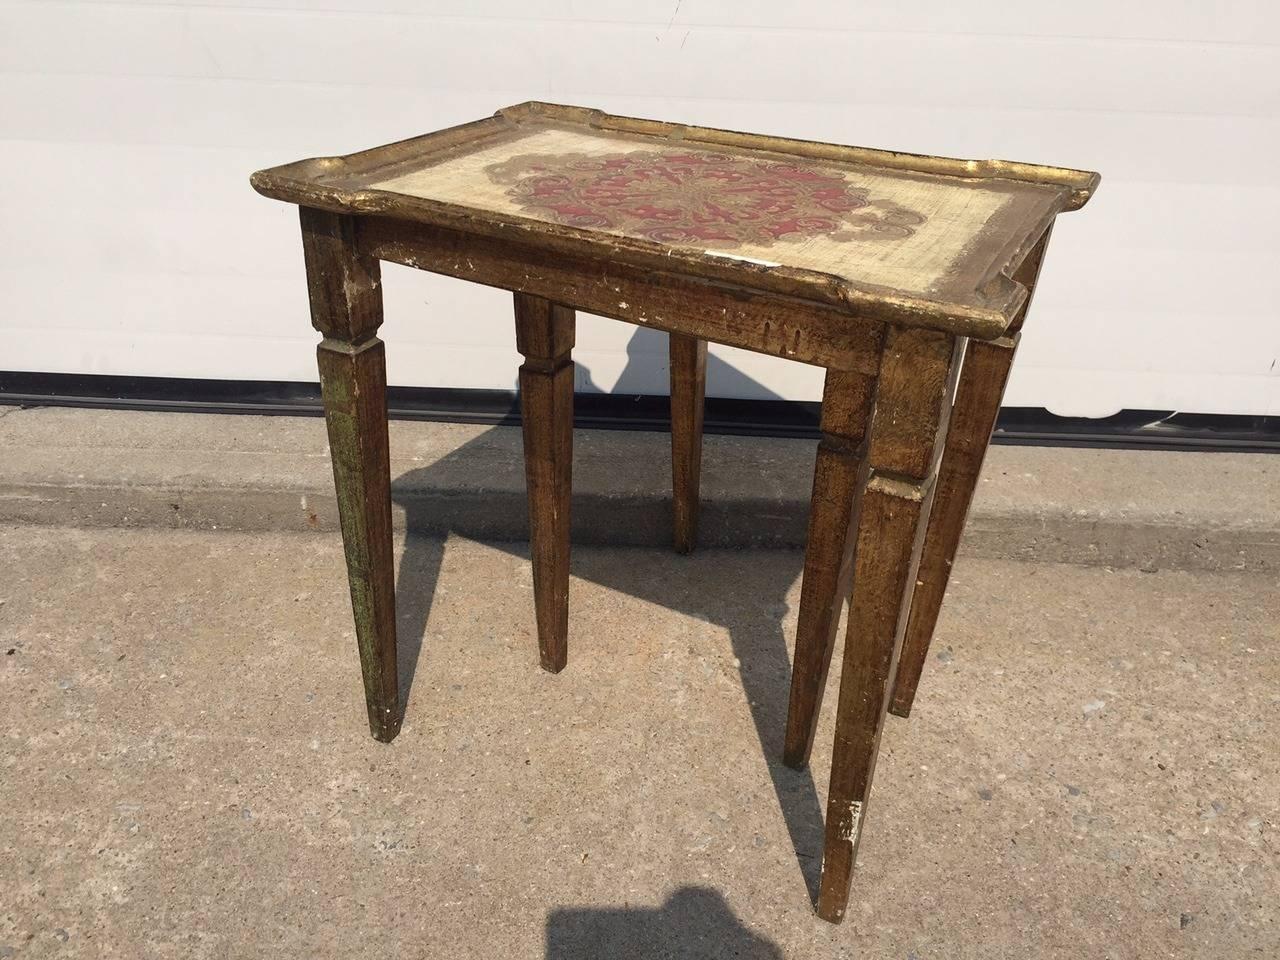 Early 1900s Italian Gilt Nesting Tables, Polychromed For Sale 1